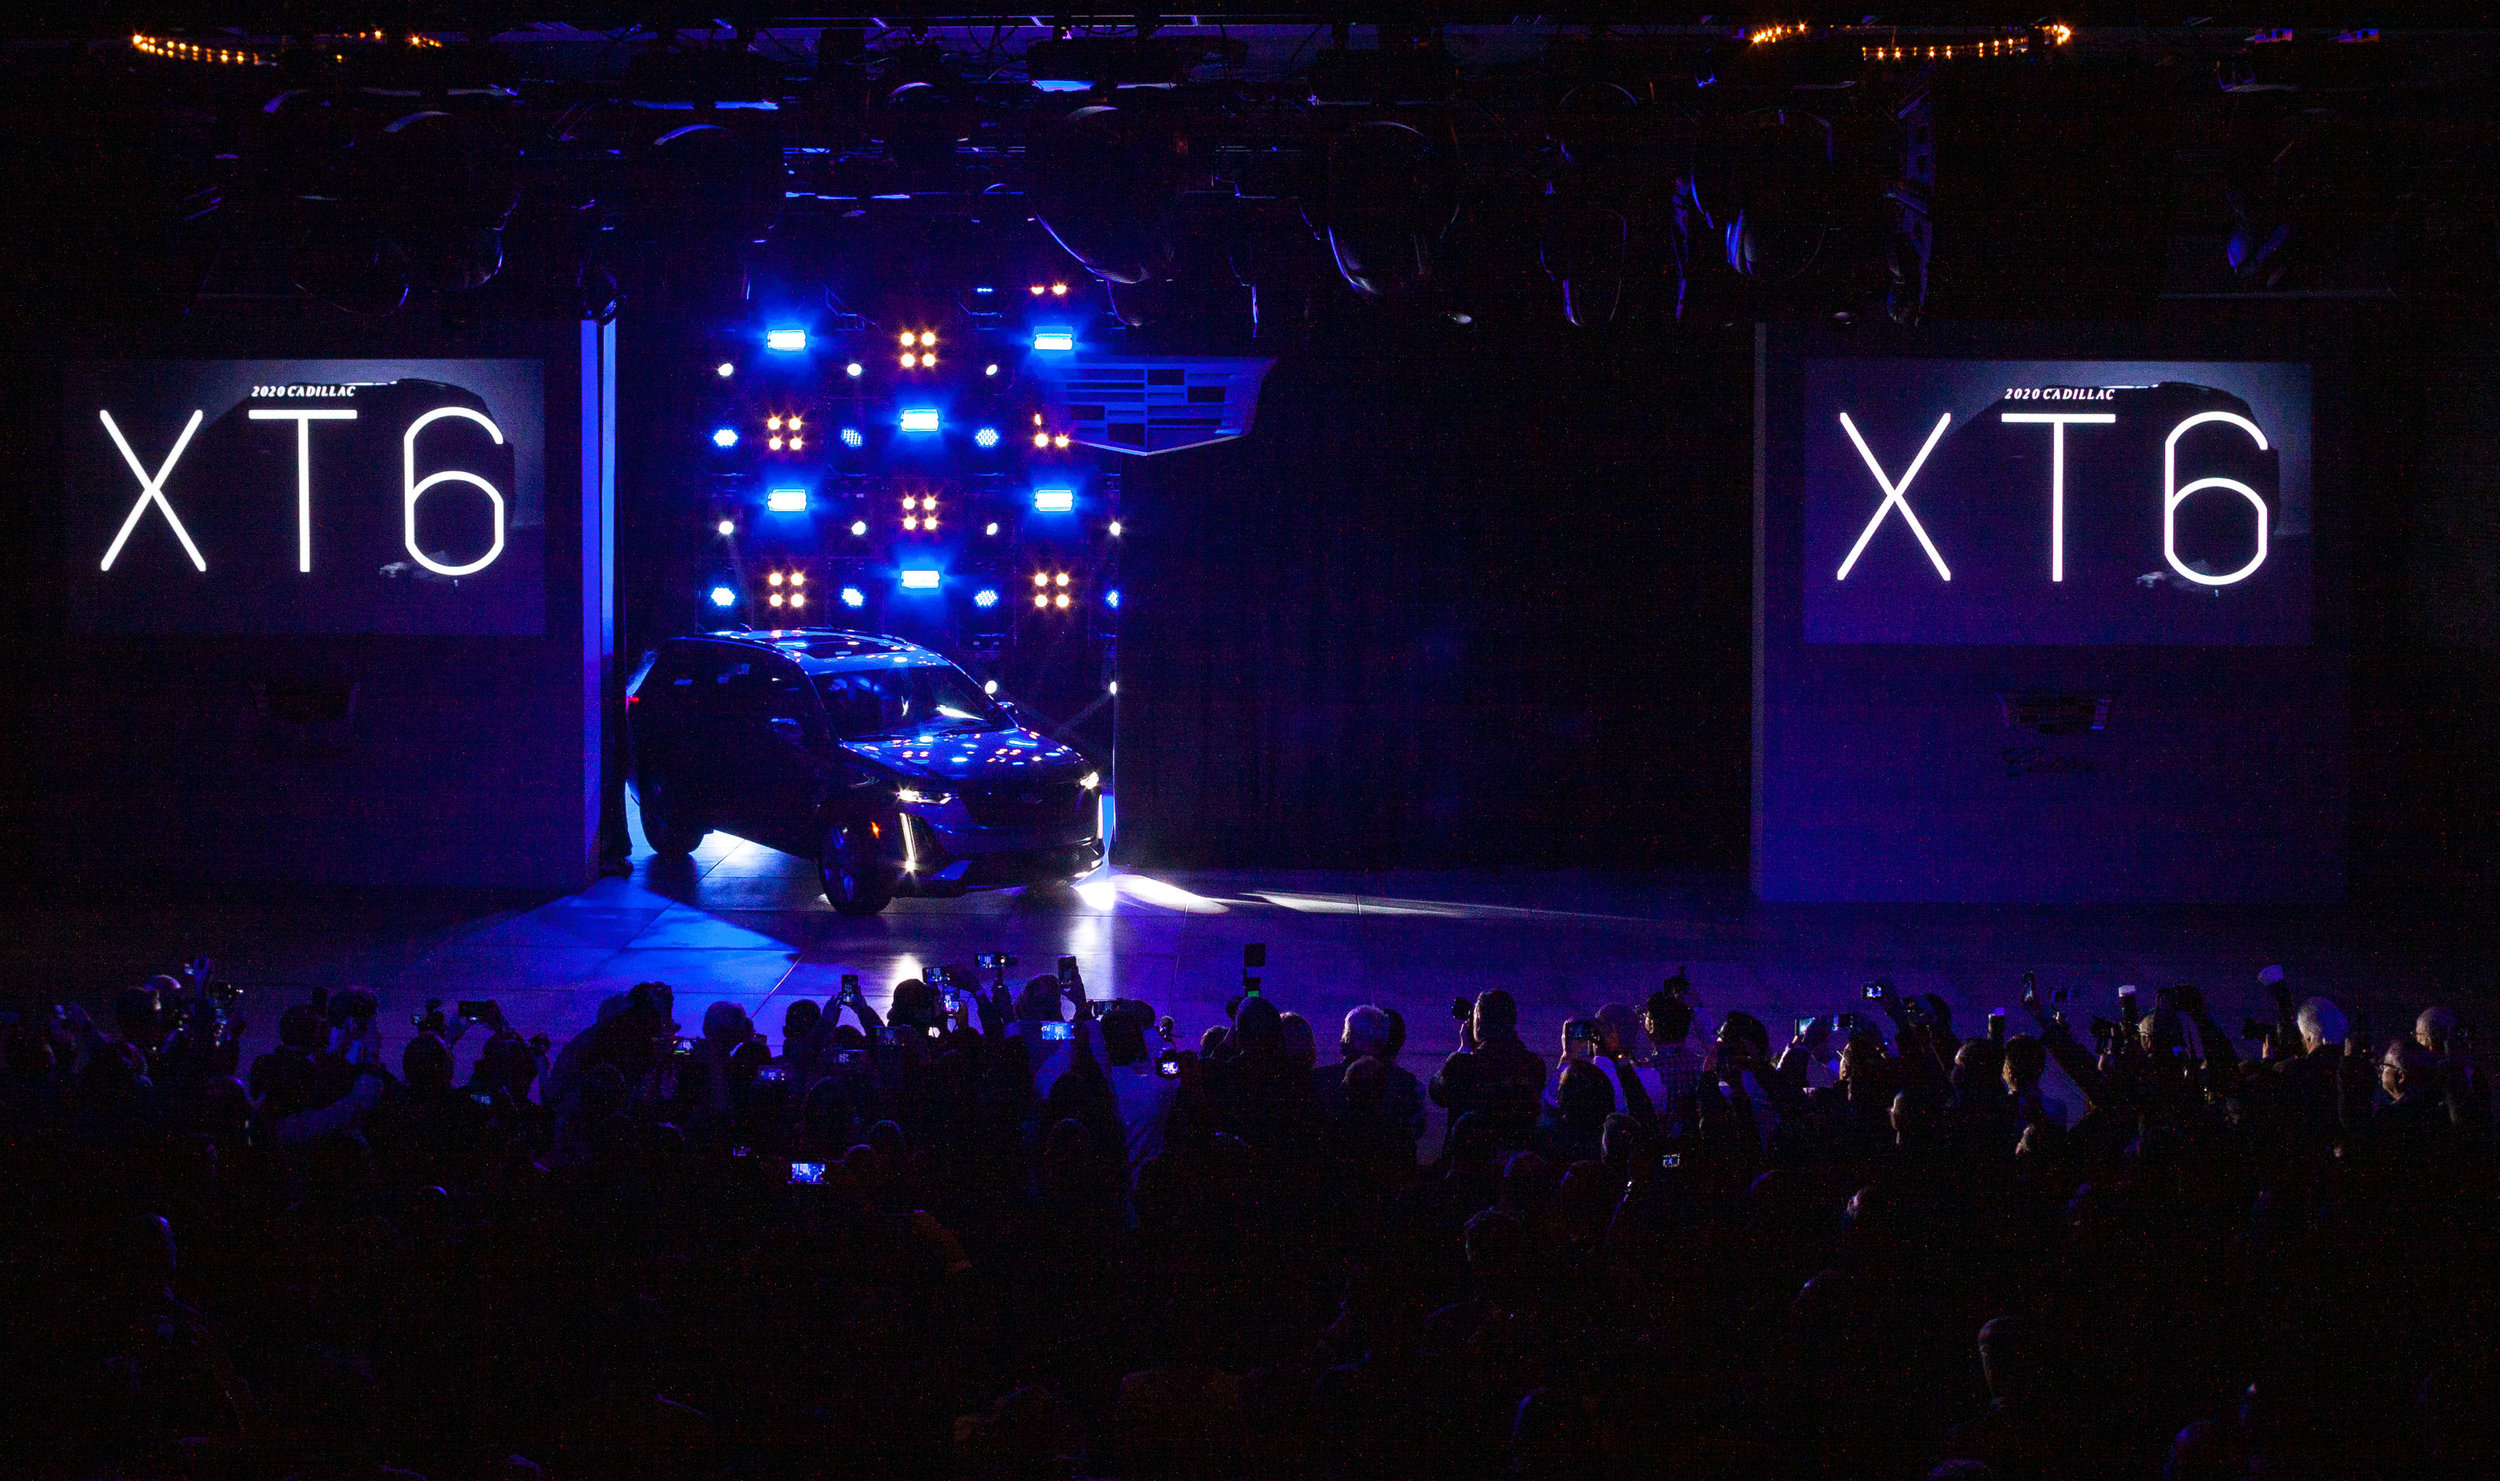 CadillacXT6Reveal02.jpg